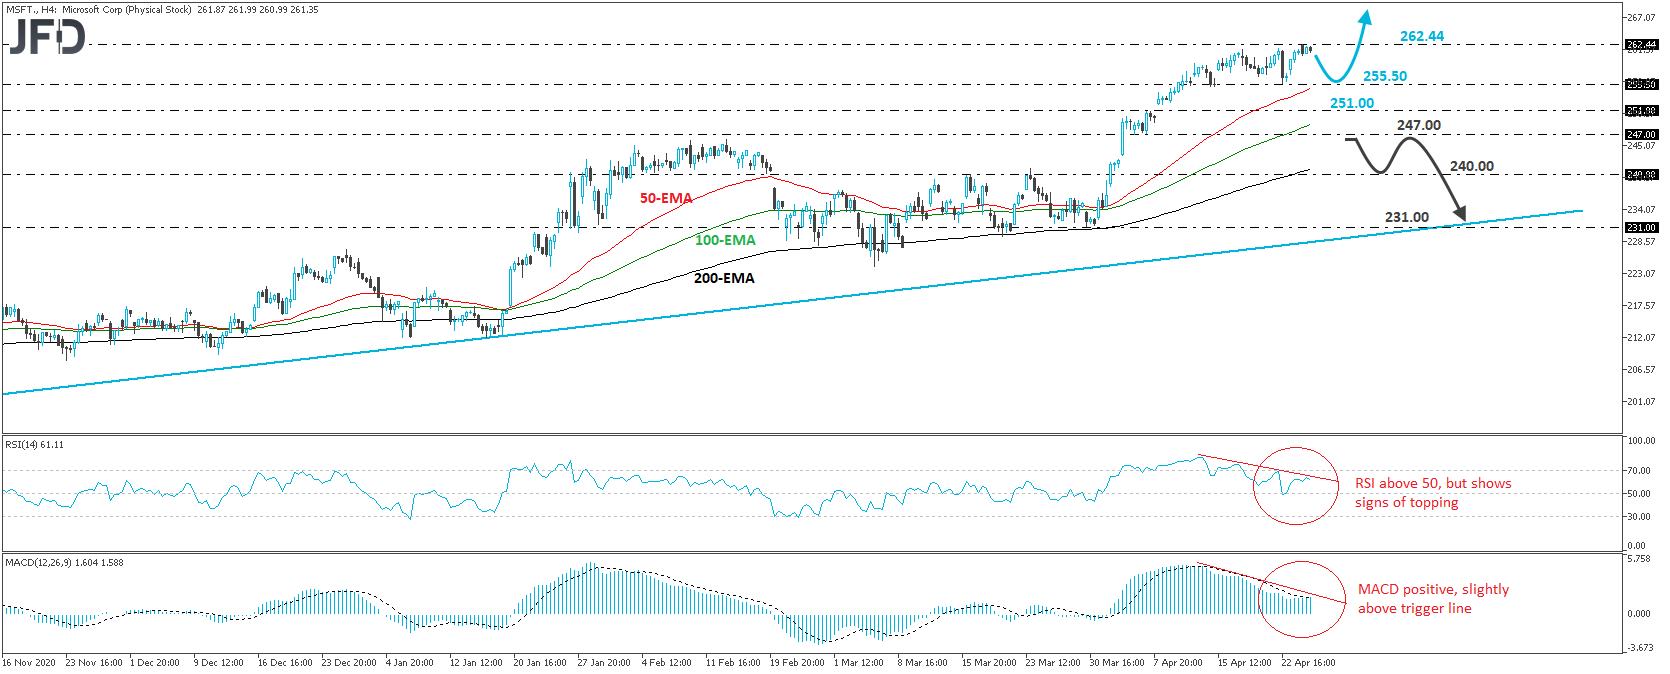 Microsoft stock 4-hour chart technical analysis